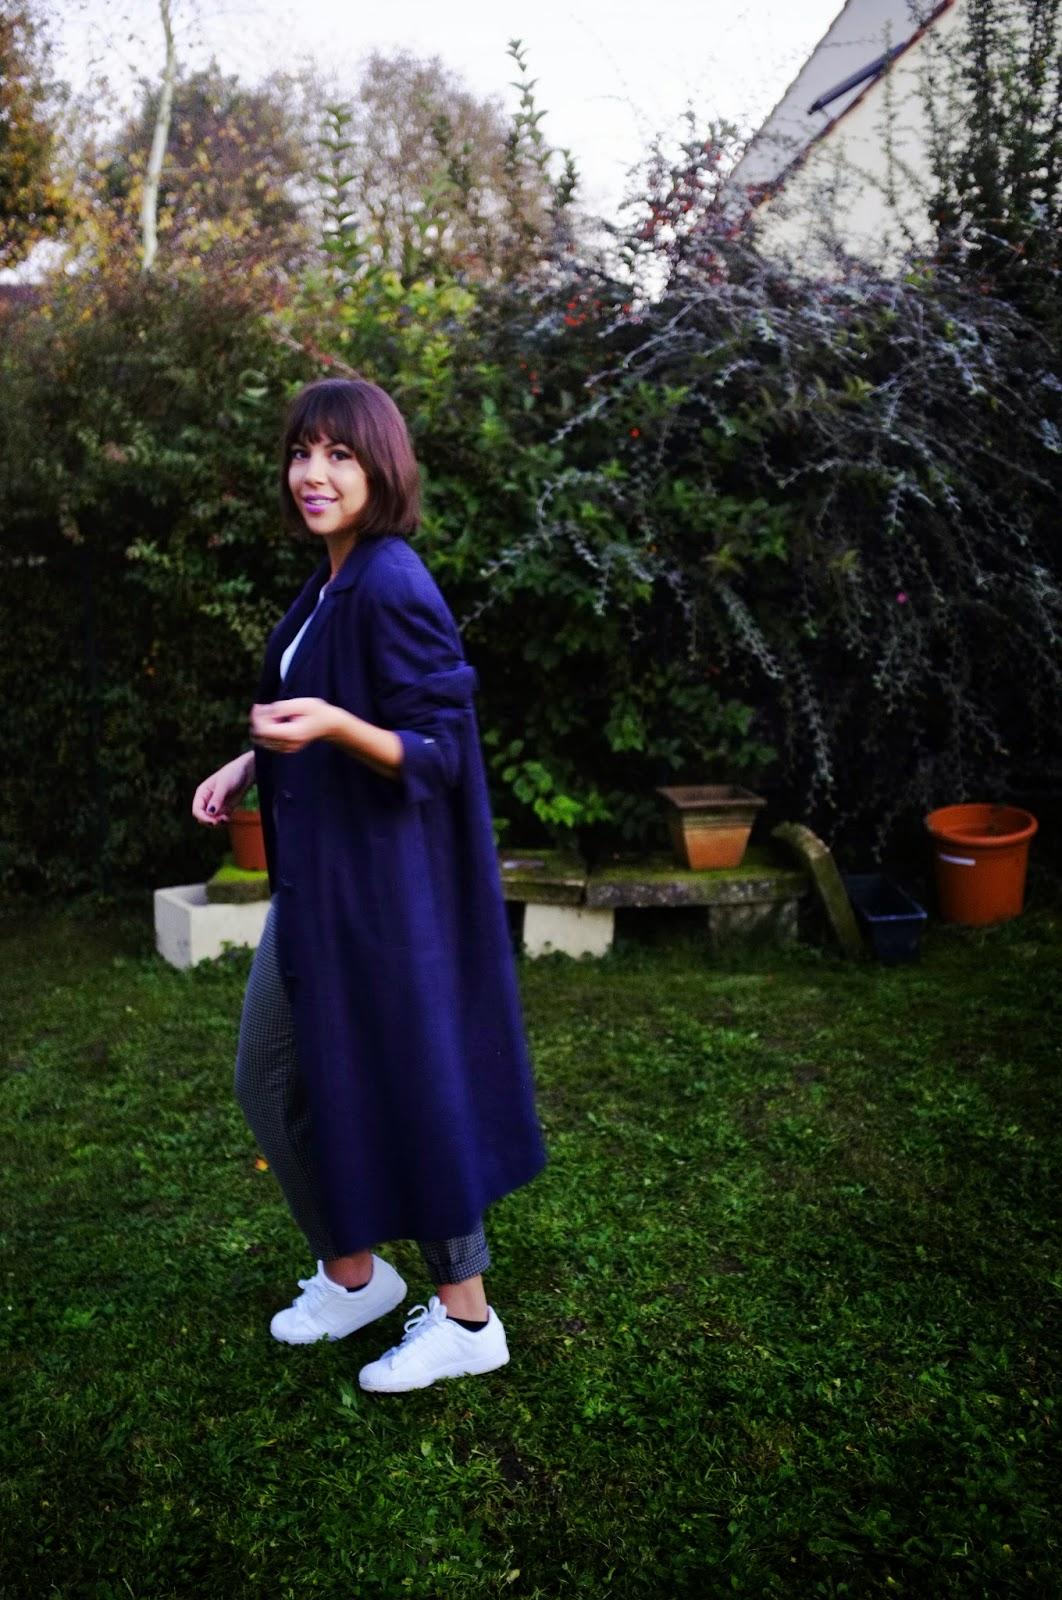 http://ielonah.blogspot.fr/2014/10/bleu-marine-blanc-carreaux.html